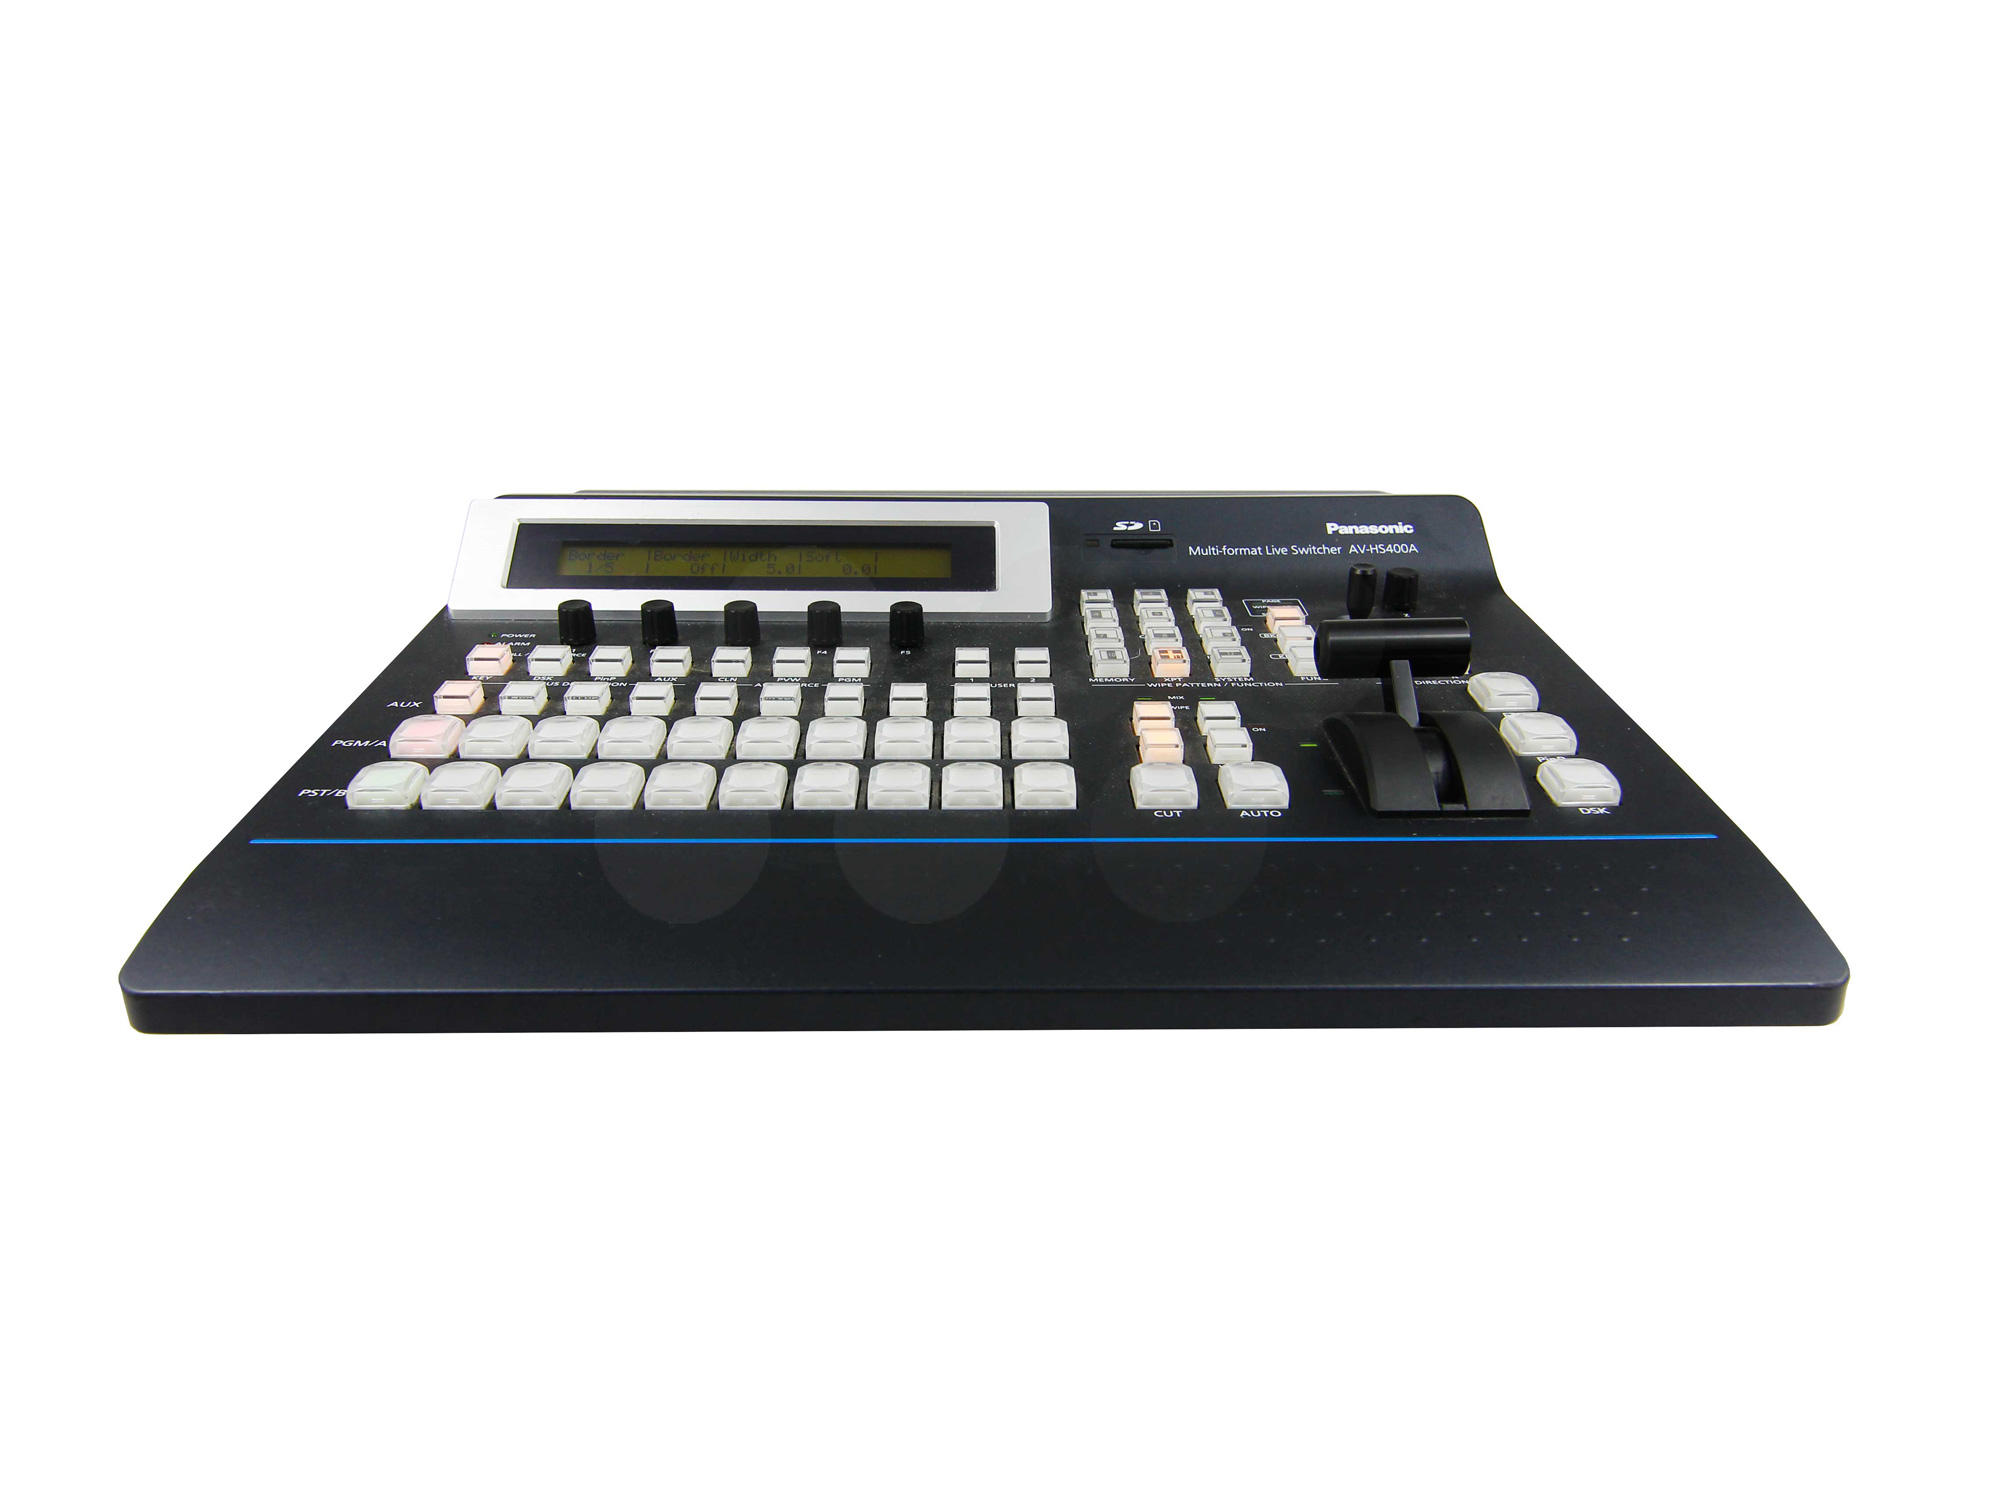 Panasonic AV-HS400A HD/SD SDI Vision Mixer